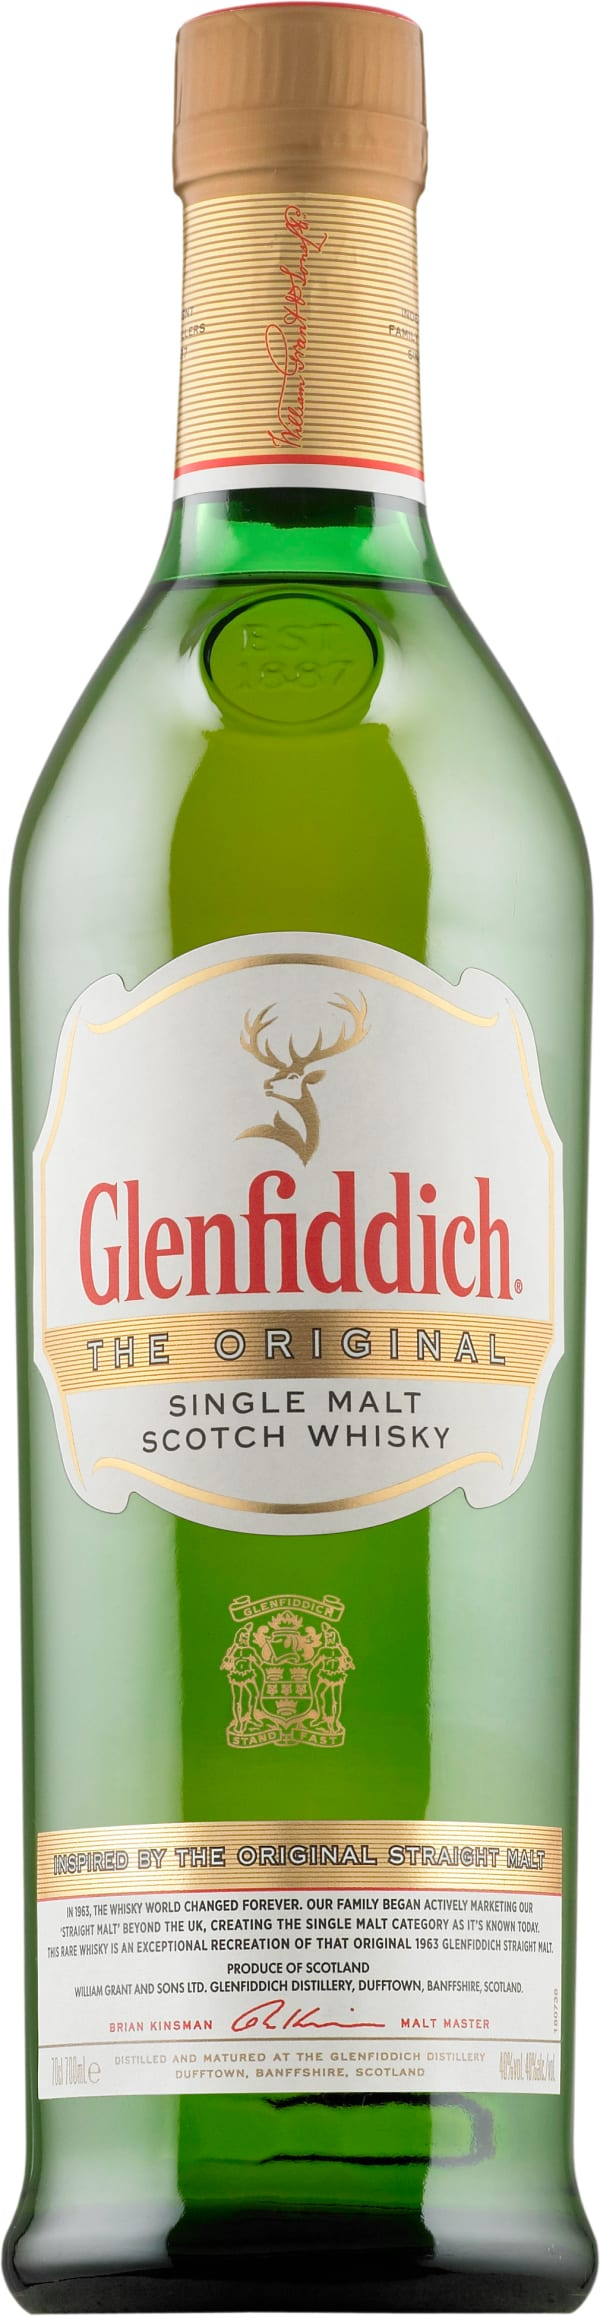 Glenfiddich The Original Single Malt